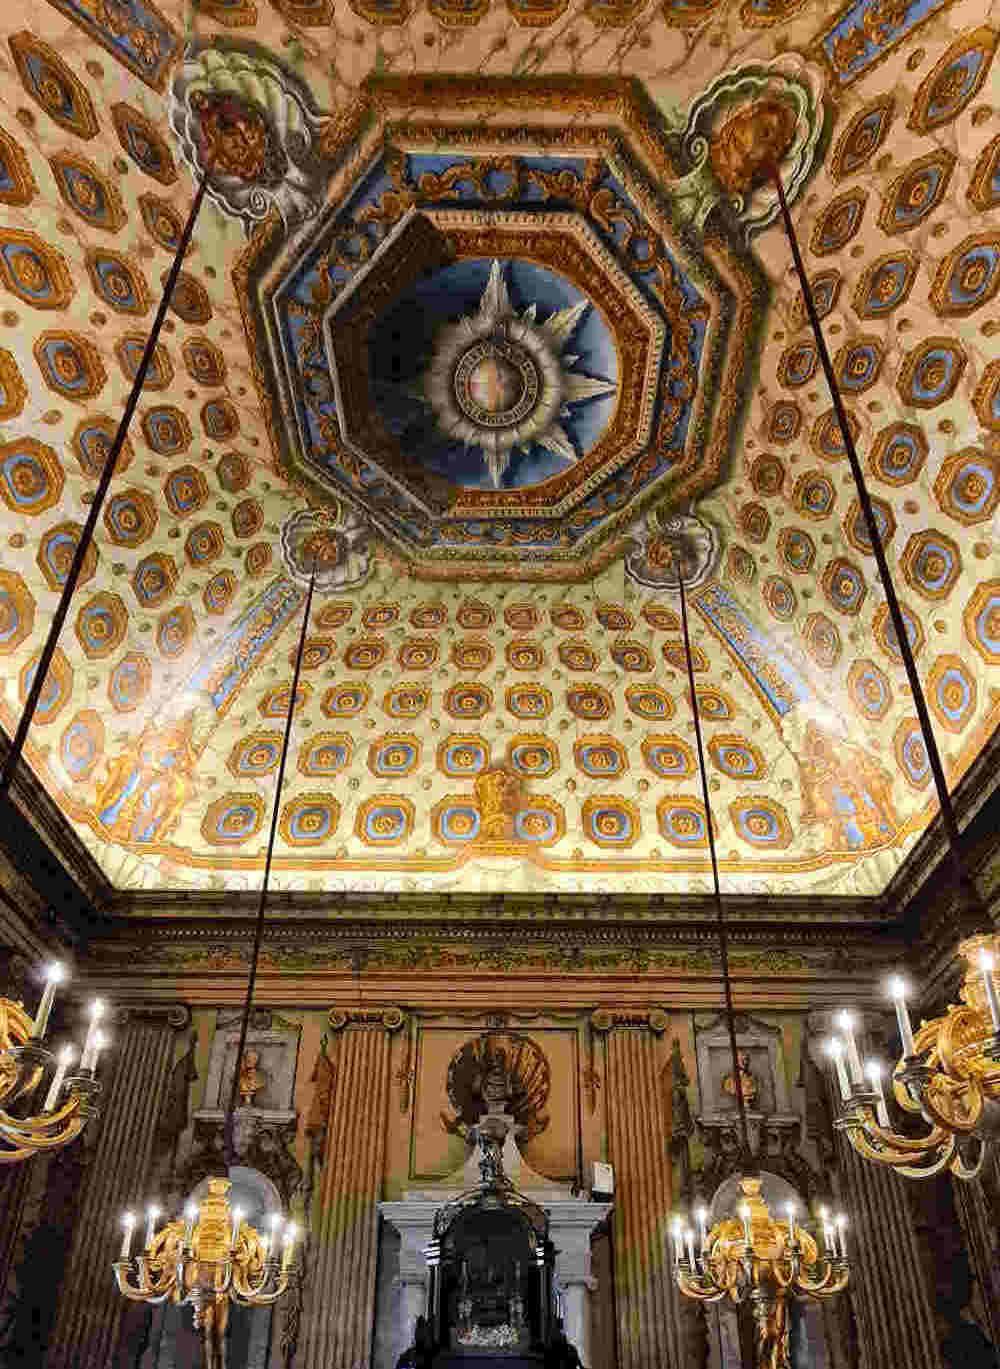 Cupola Room, Kensington Palace